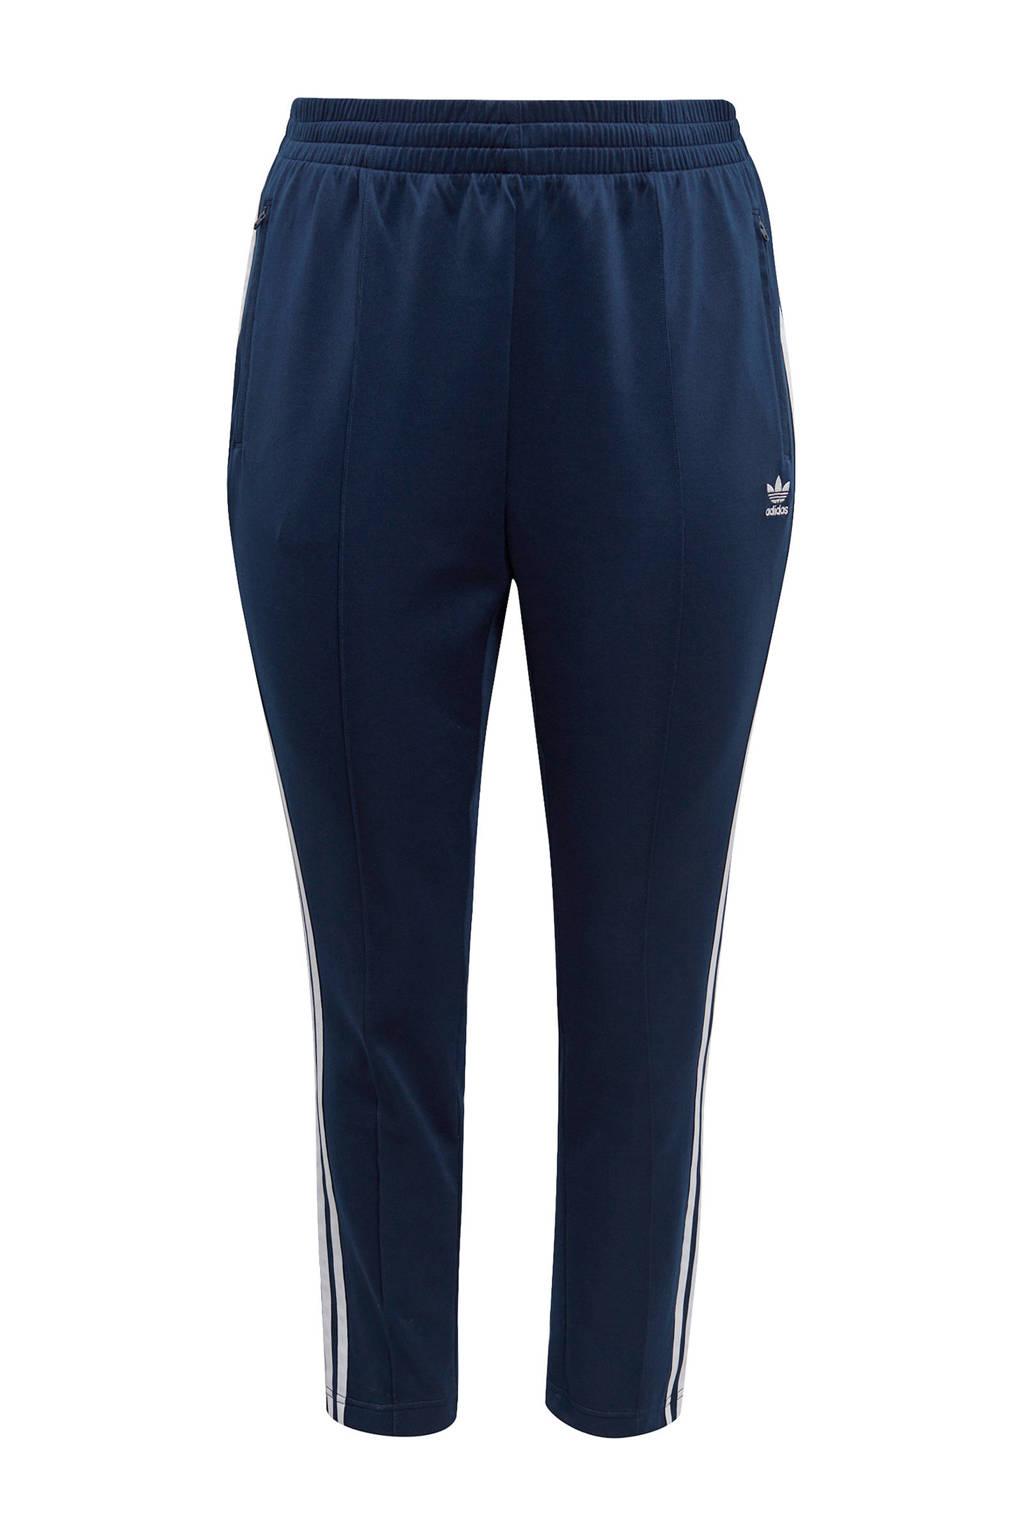 adidas Originals Plus Size joggingbroek donkerblauw/wit, Donkerblauw/wit